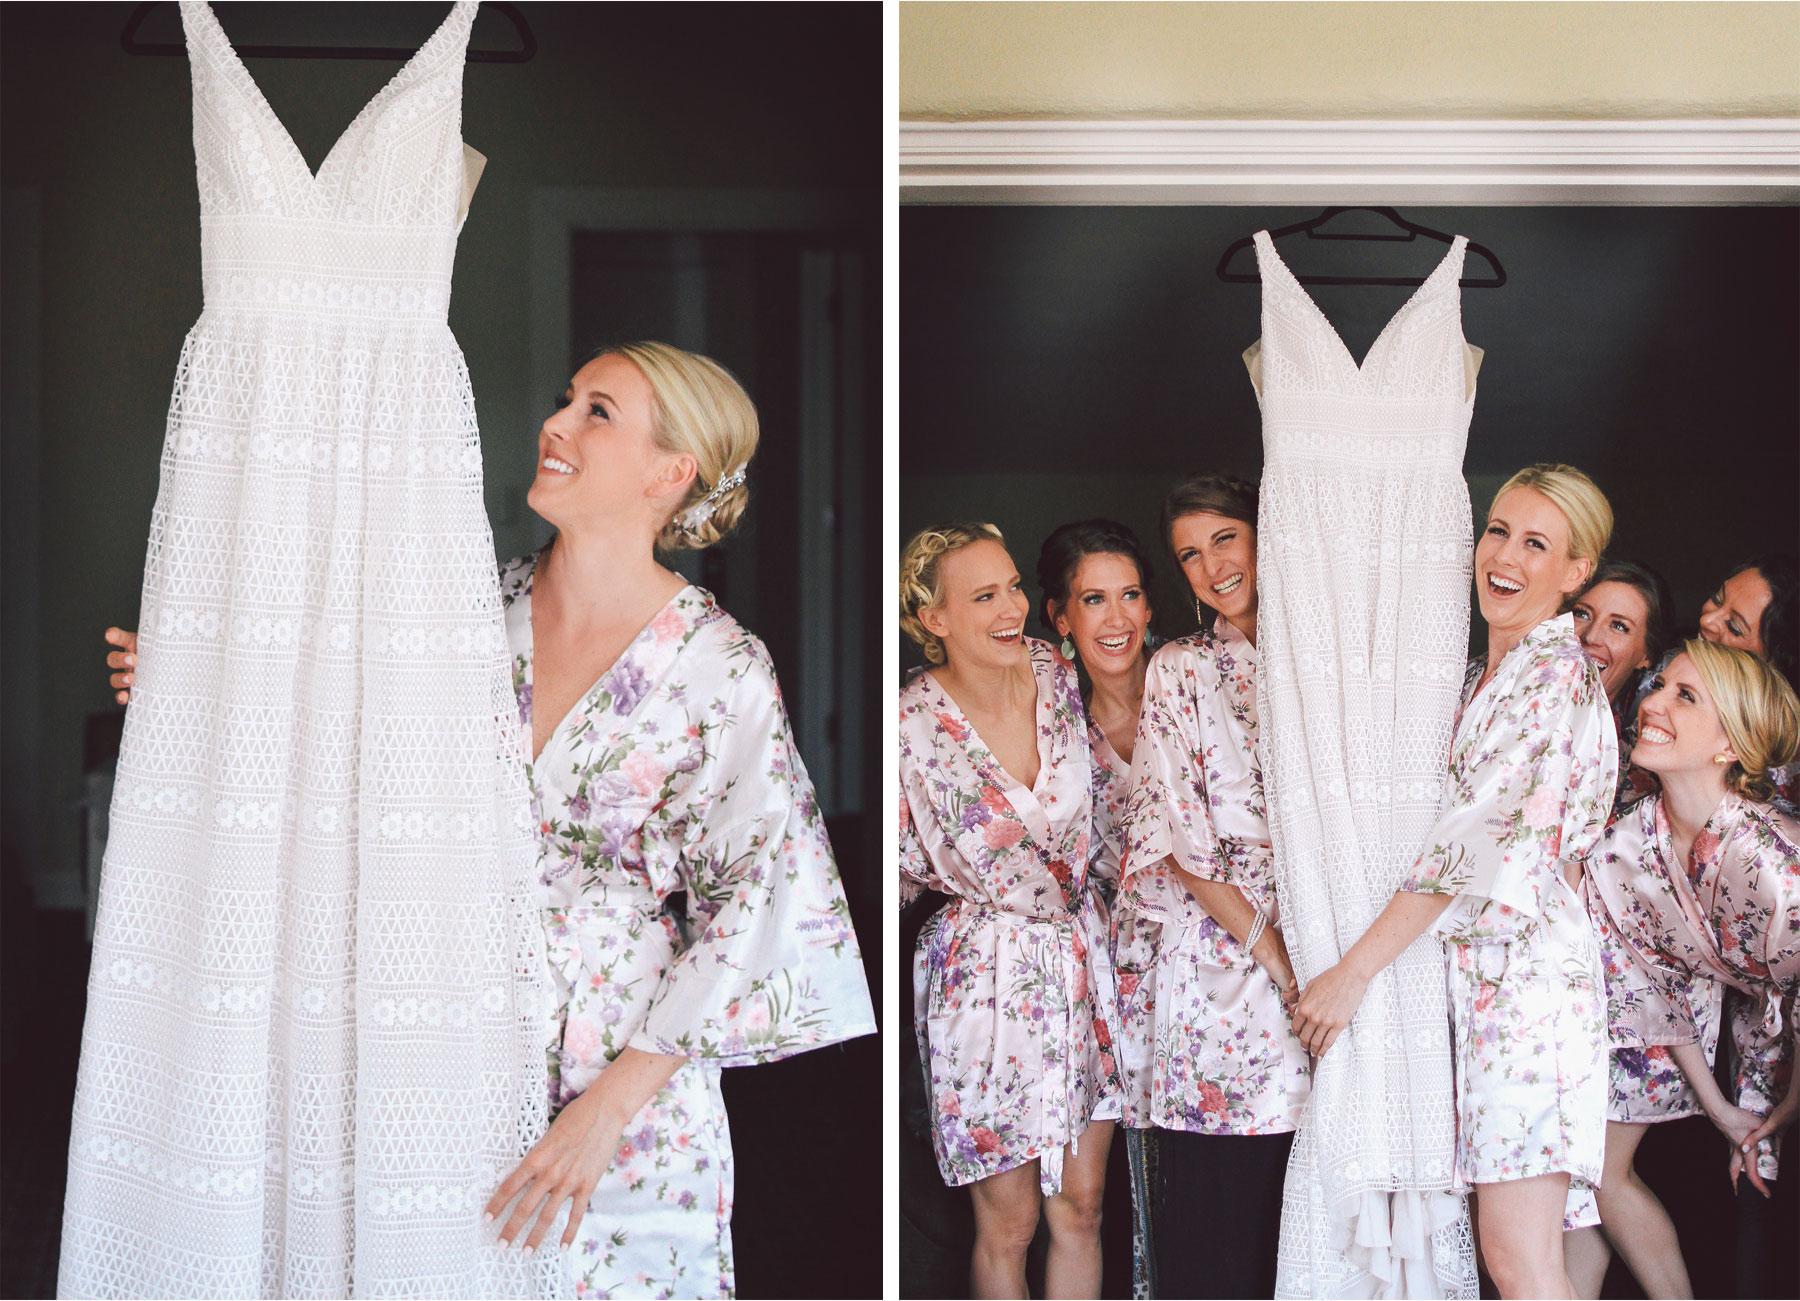 02-Minneapolis-Minnesota-Wedding-Photography-by-Vick-Photography-Lafayette-Club-Dress-Wedding-Morning-Maggie-and-Nicholas.jpg